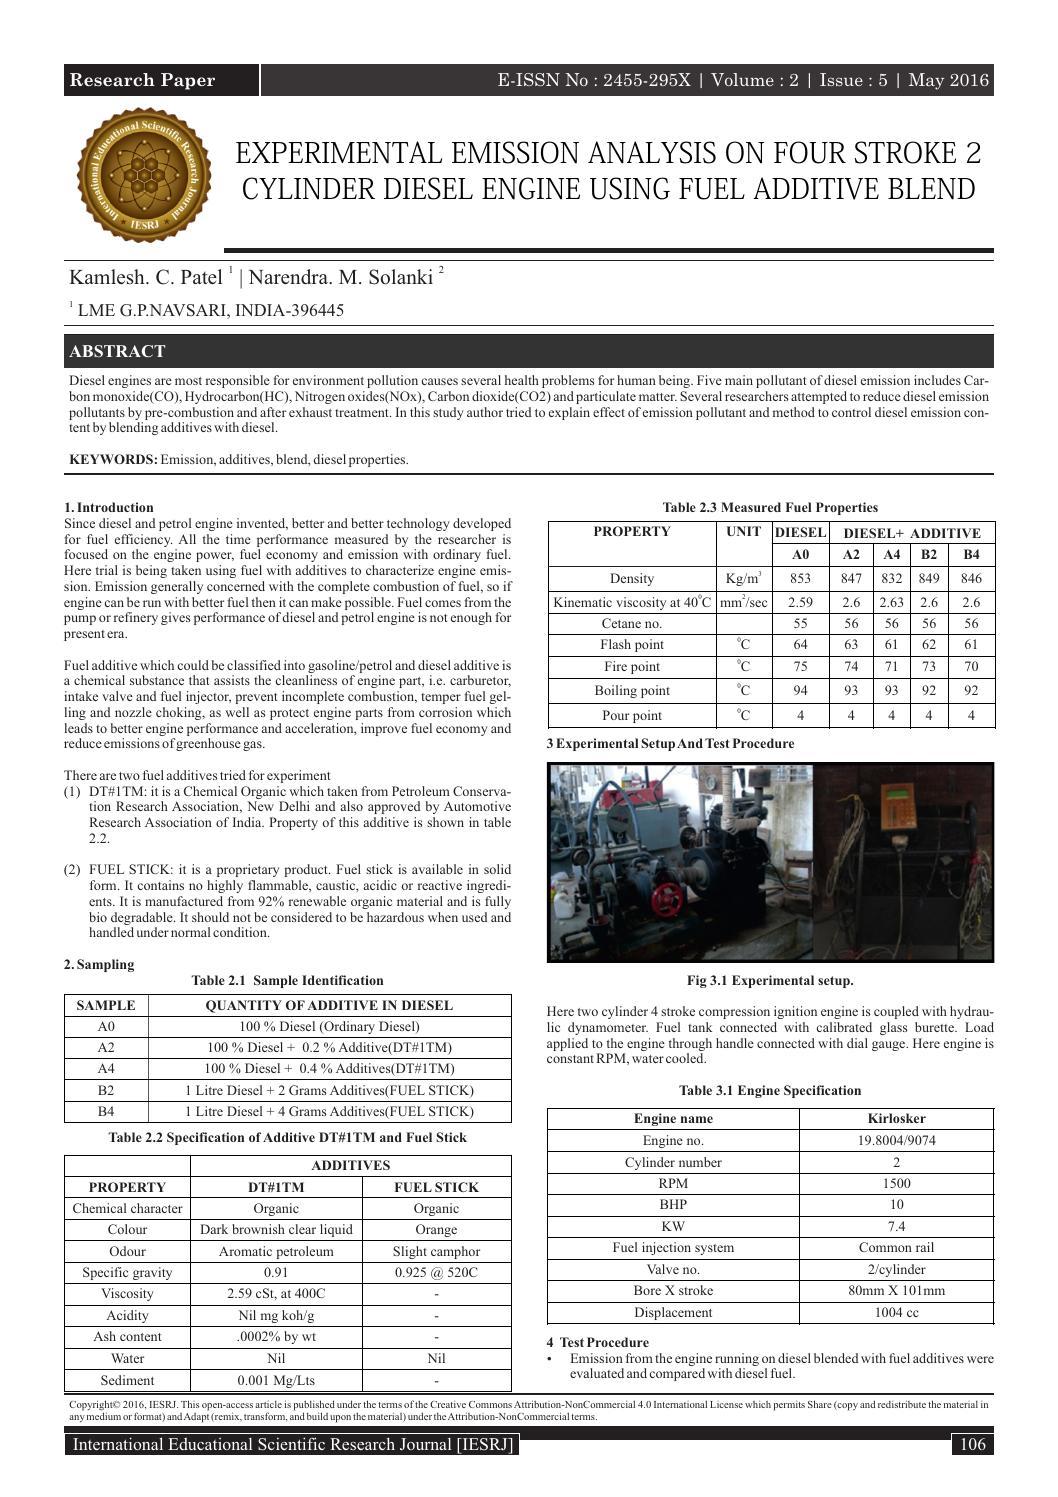 EXPERIMENTAL EMISSION ANALYSIS ON FOUR STROKE 2 CYLINDER